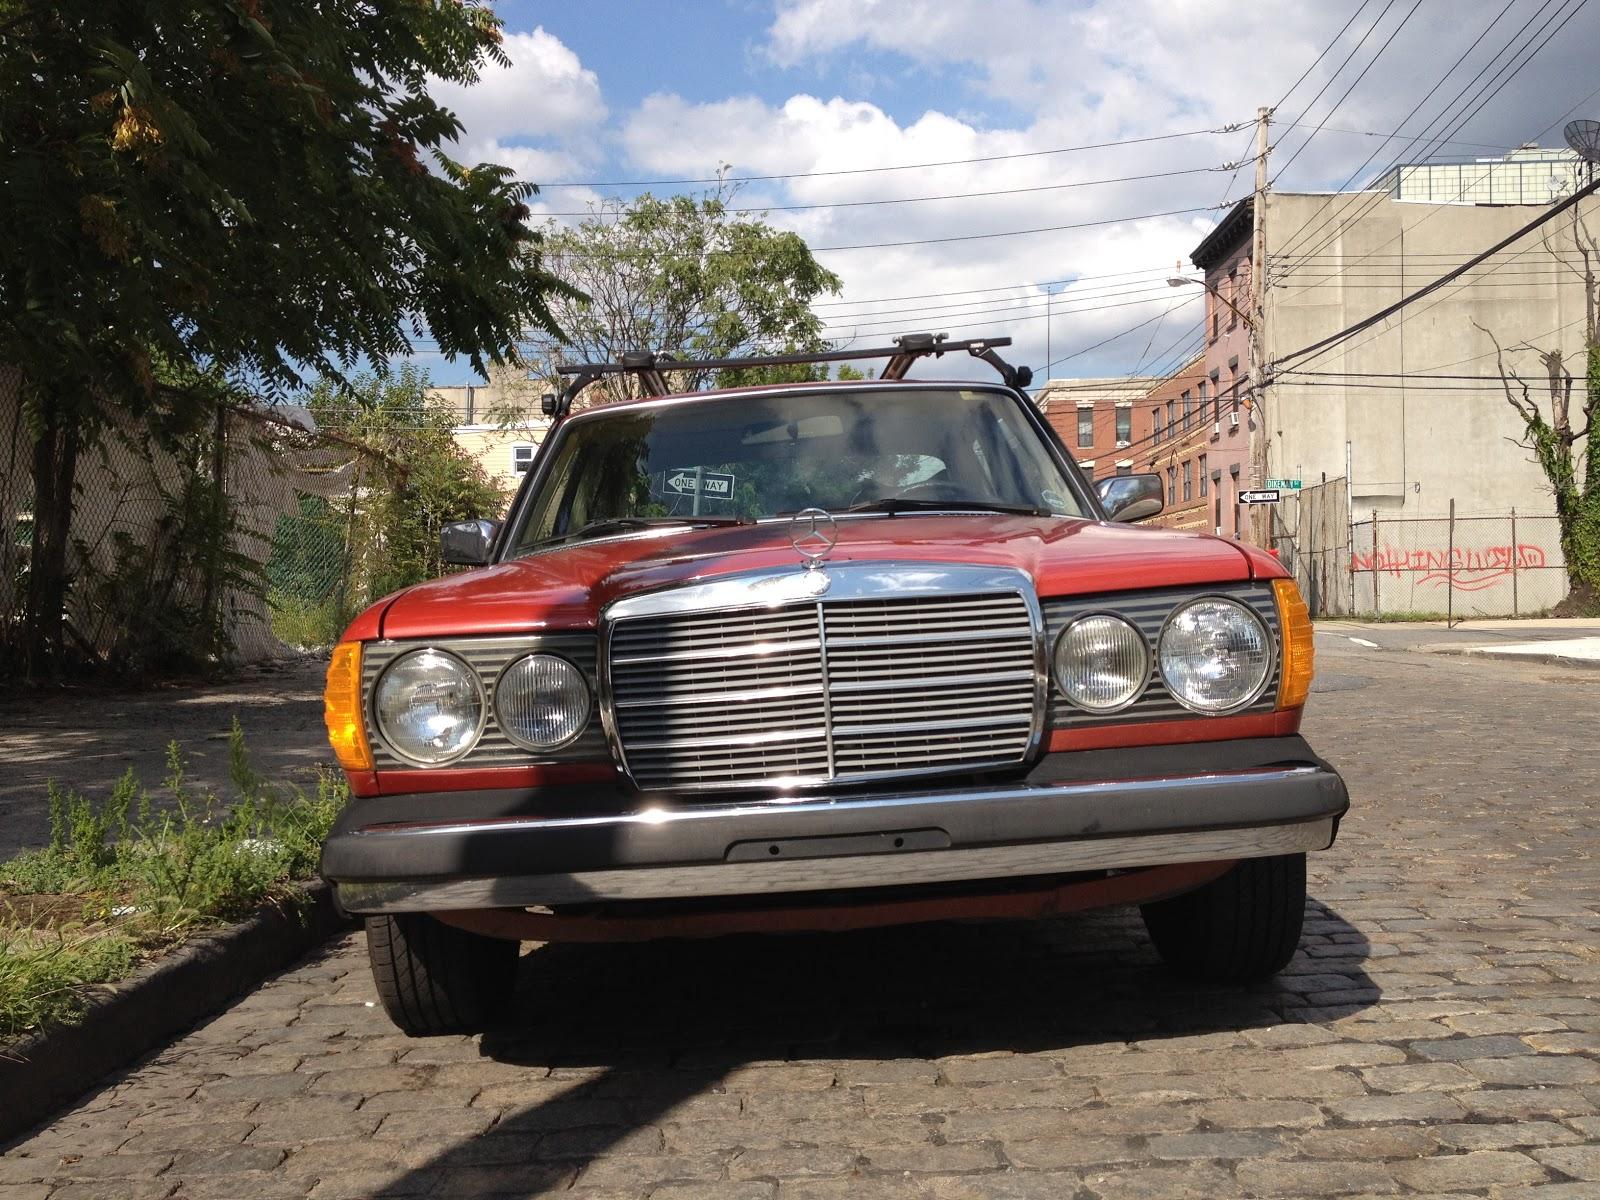 Cscb home 1982 mercedes benz 300d turbo diesel for Mercedes benz 300d